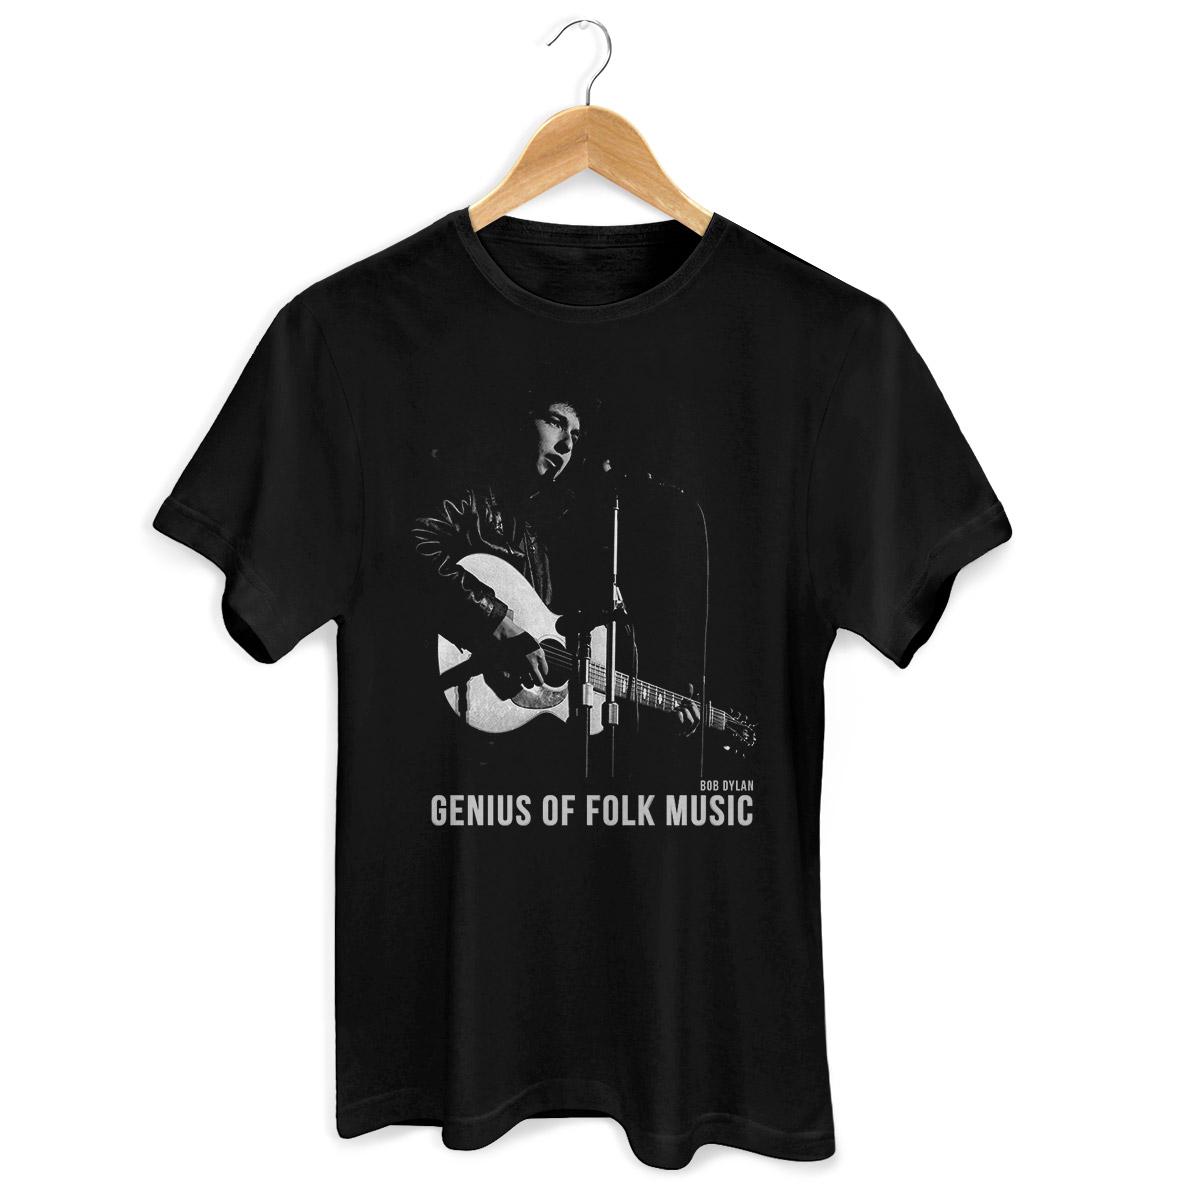 Camiseta Masculina Bob Dylan Genius Of Folk Music